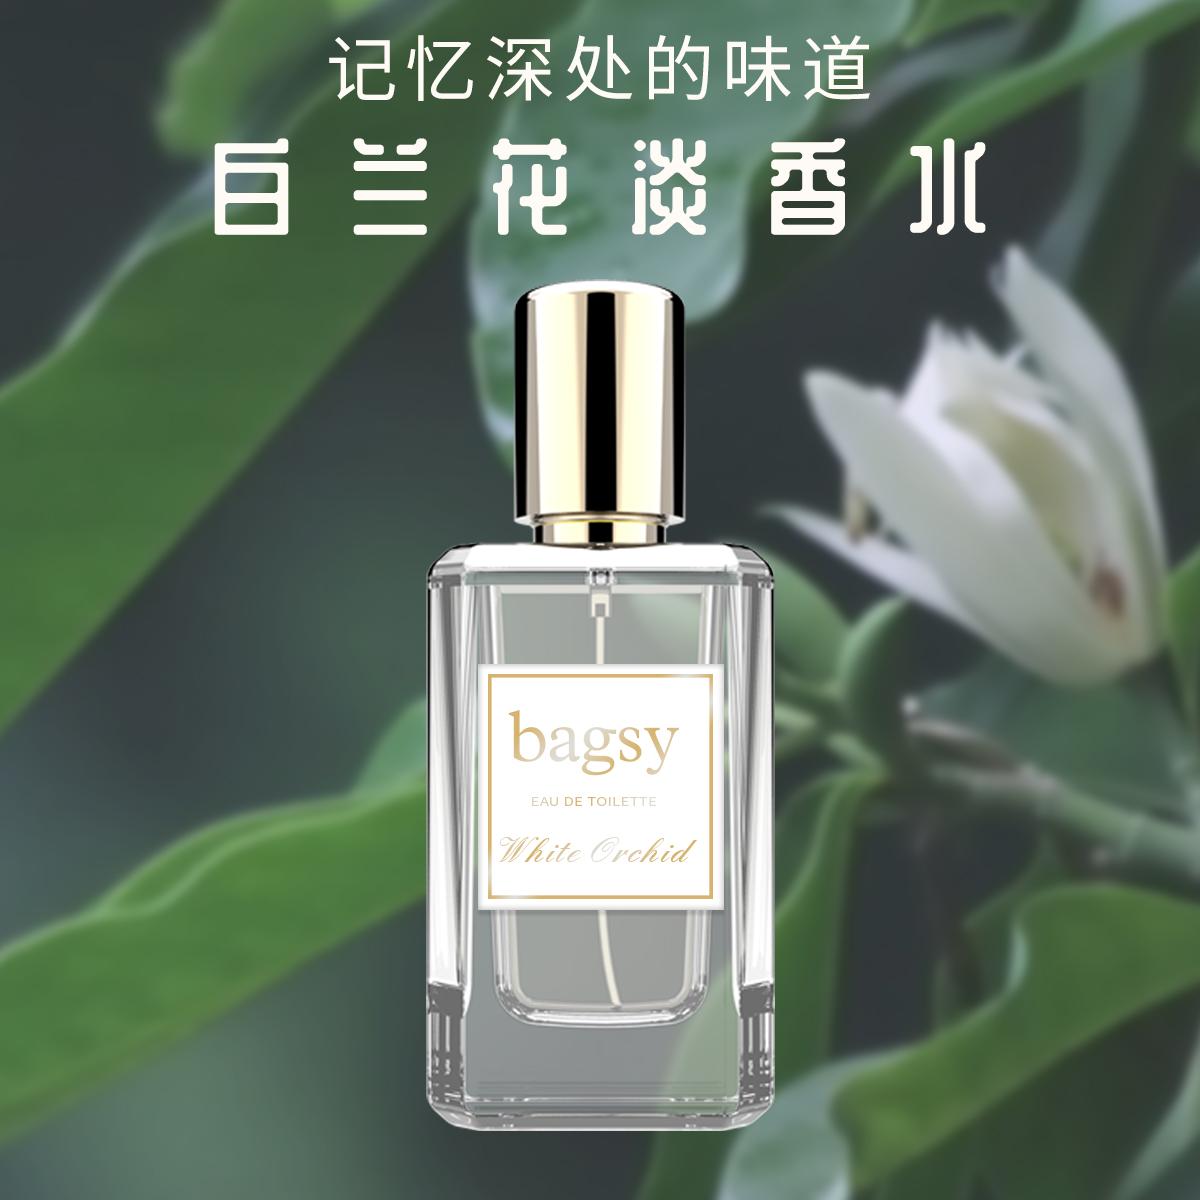 bagsy香水白兰花女士清新自然花香持久淡香学生小众正品礼盒30ml